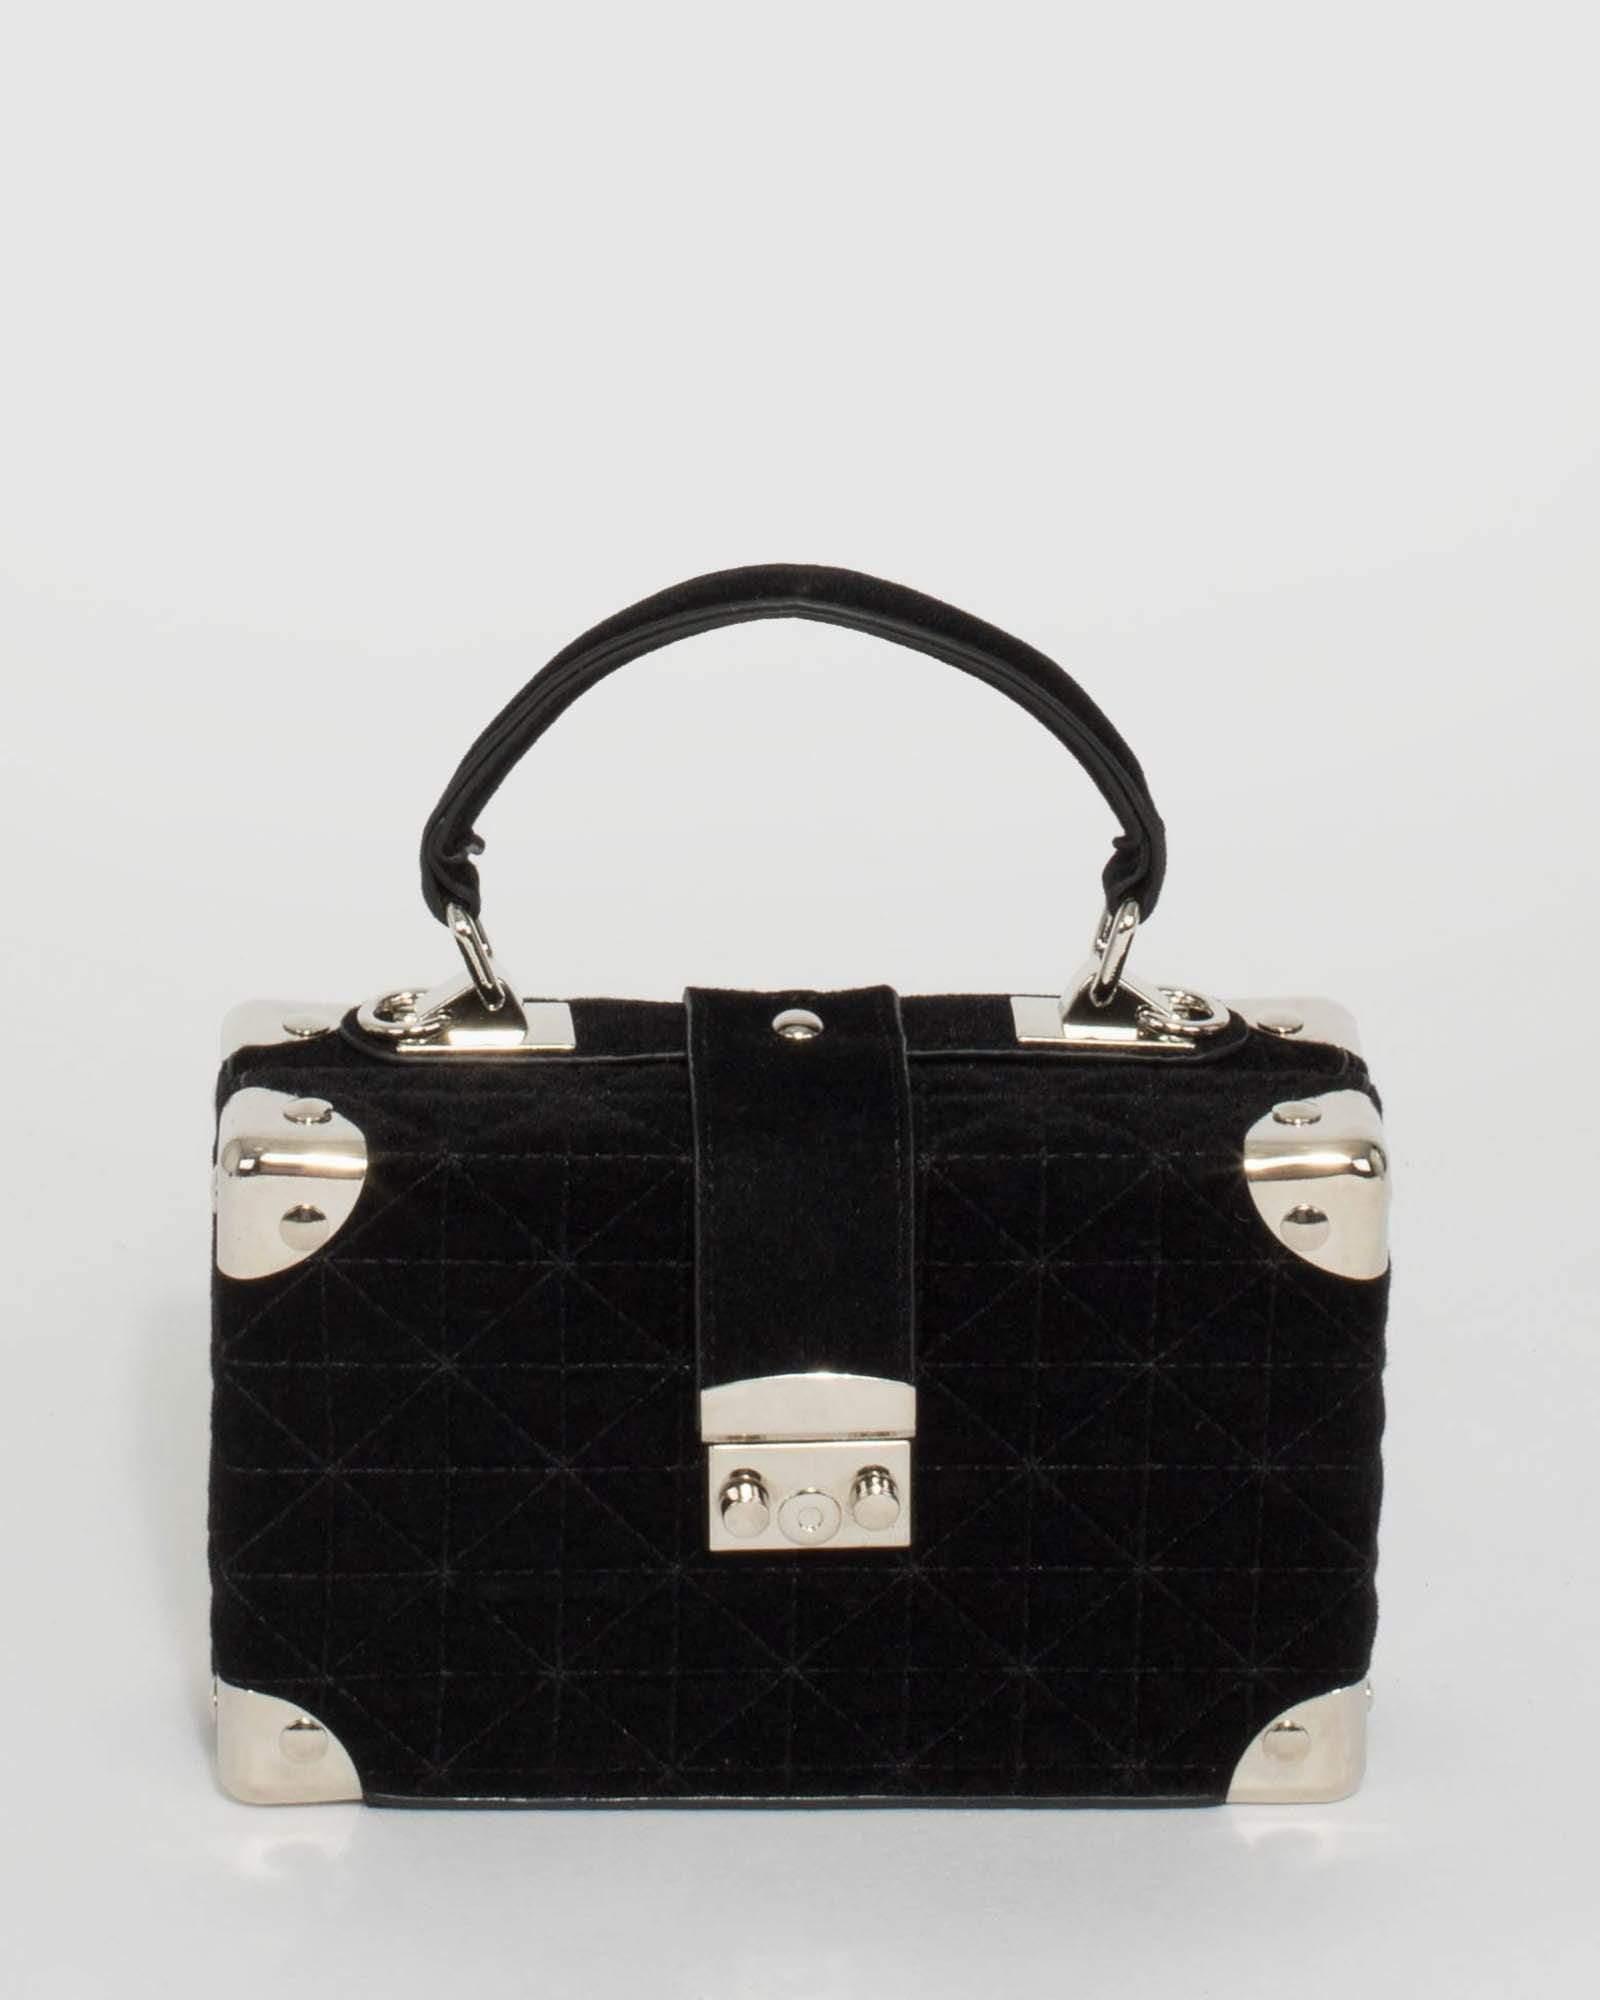 black-kendall-quilt-trunk-bag-18657702805576